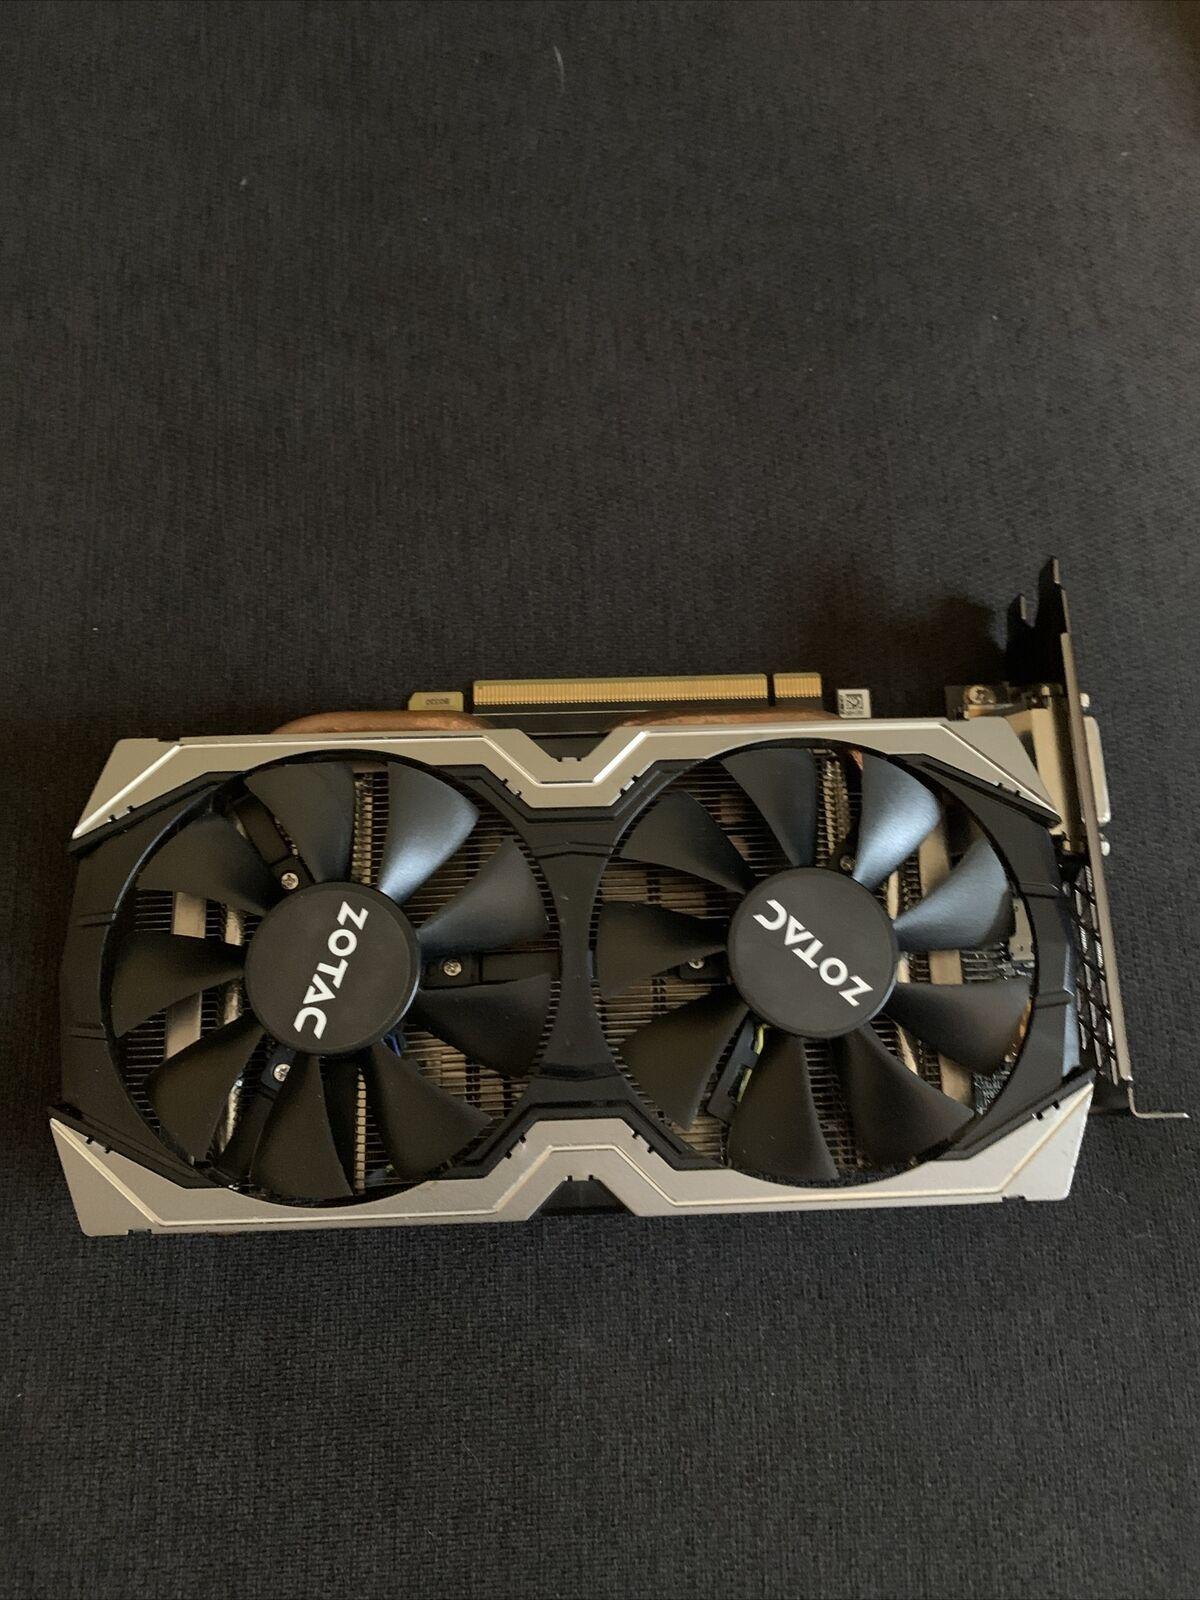 Zotac GeForce GTX 1060 6GB AMP! Edition Graphics Card